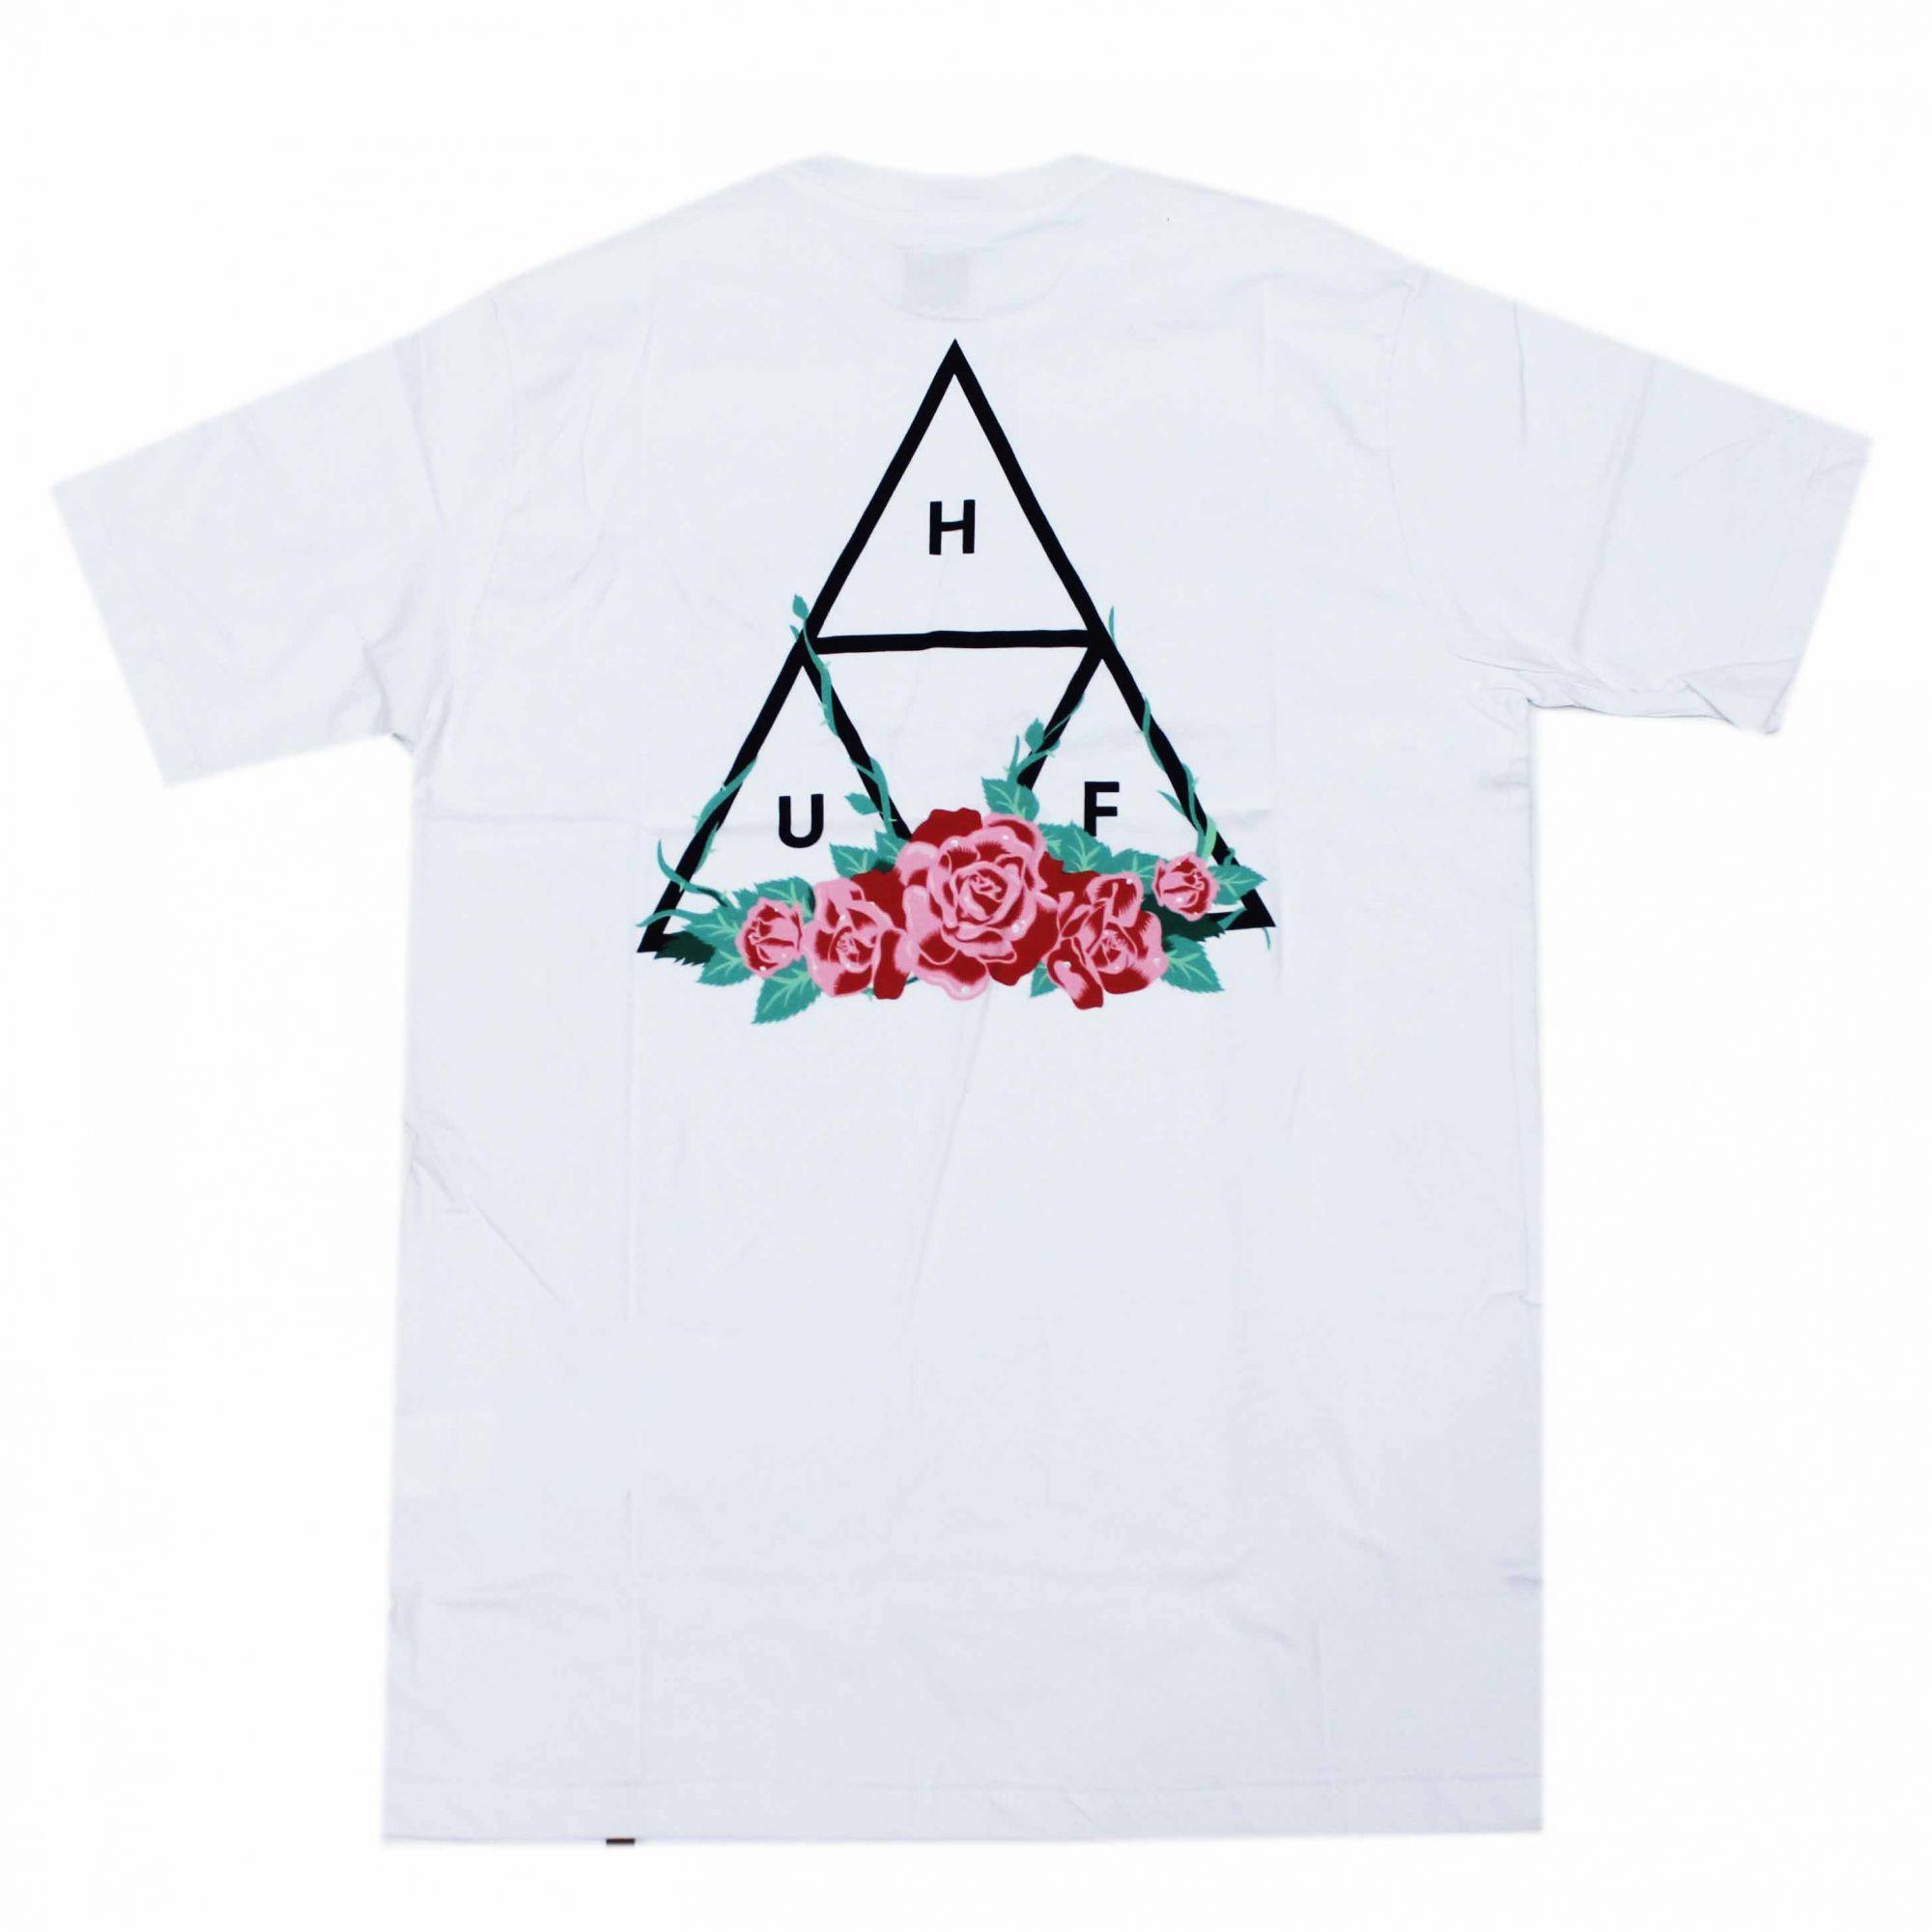 Camiseta HUF City Rose Branco